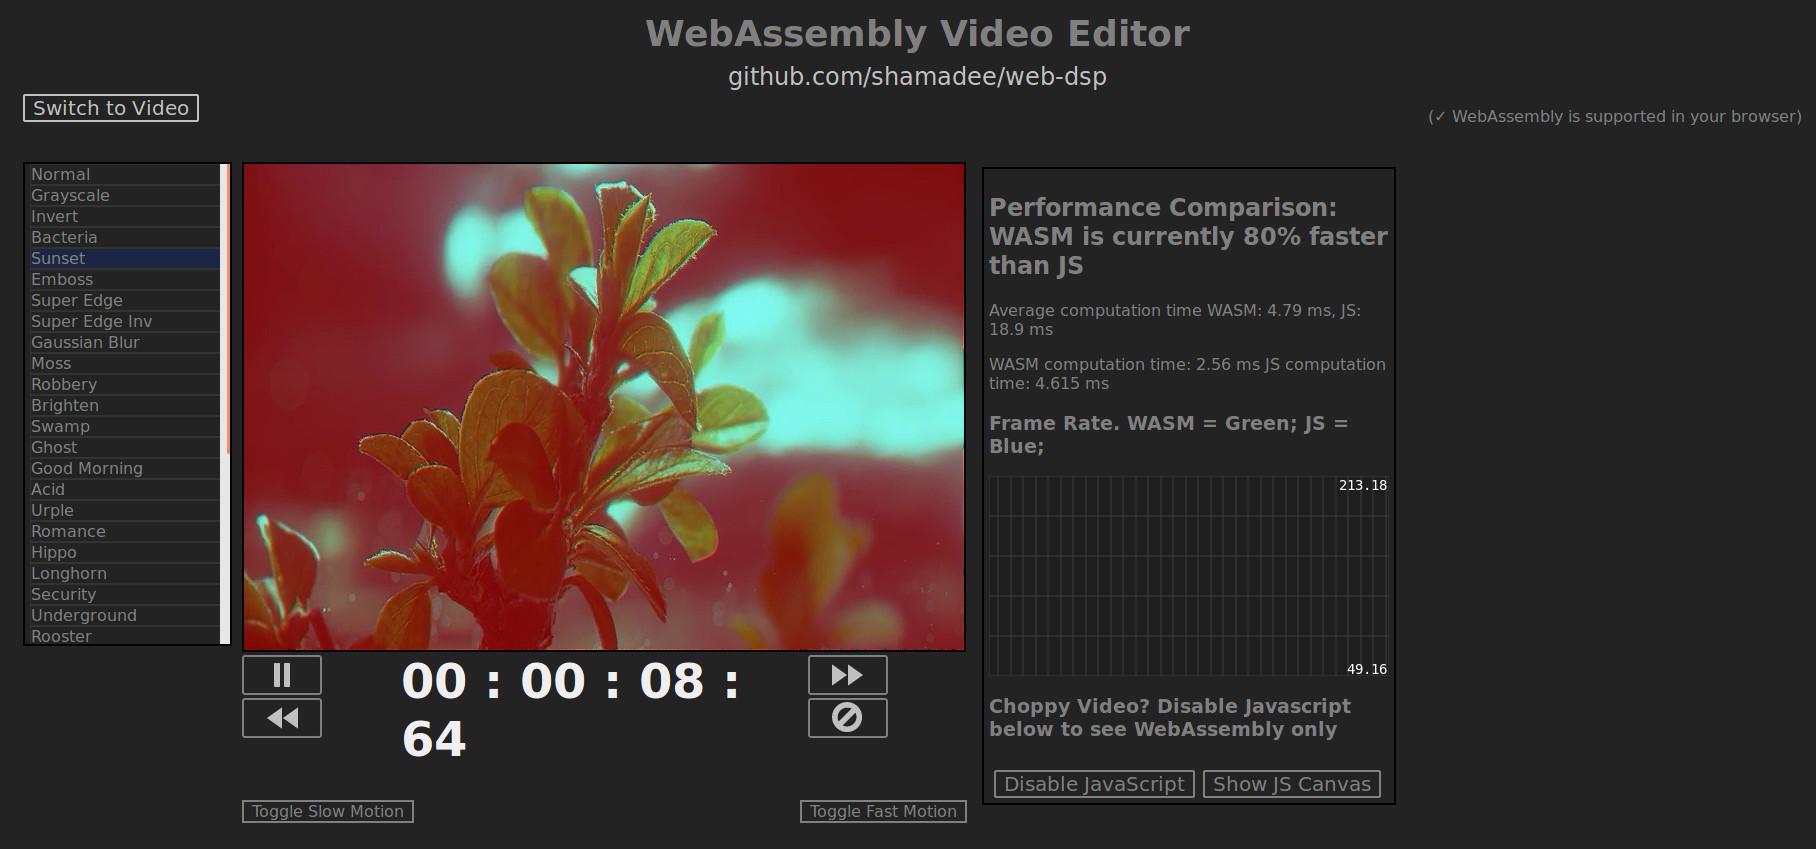 WebAssembly is a Cross-Platform, Cross-Browser